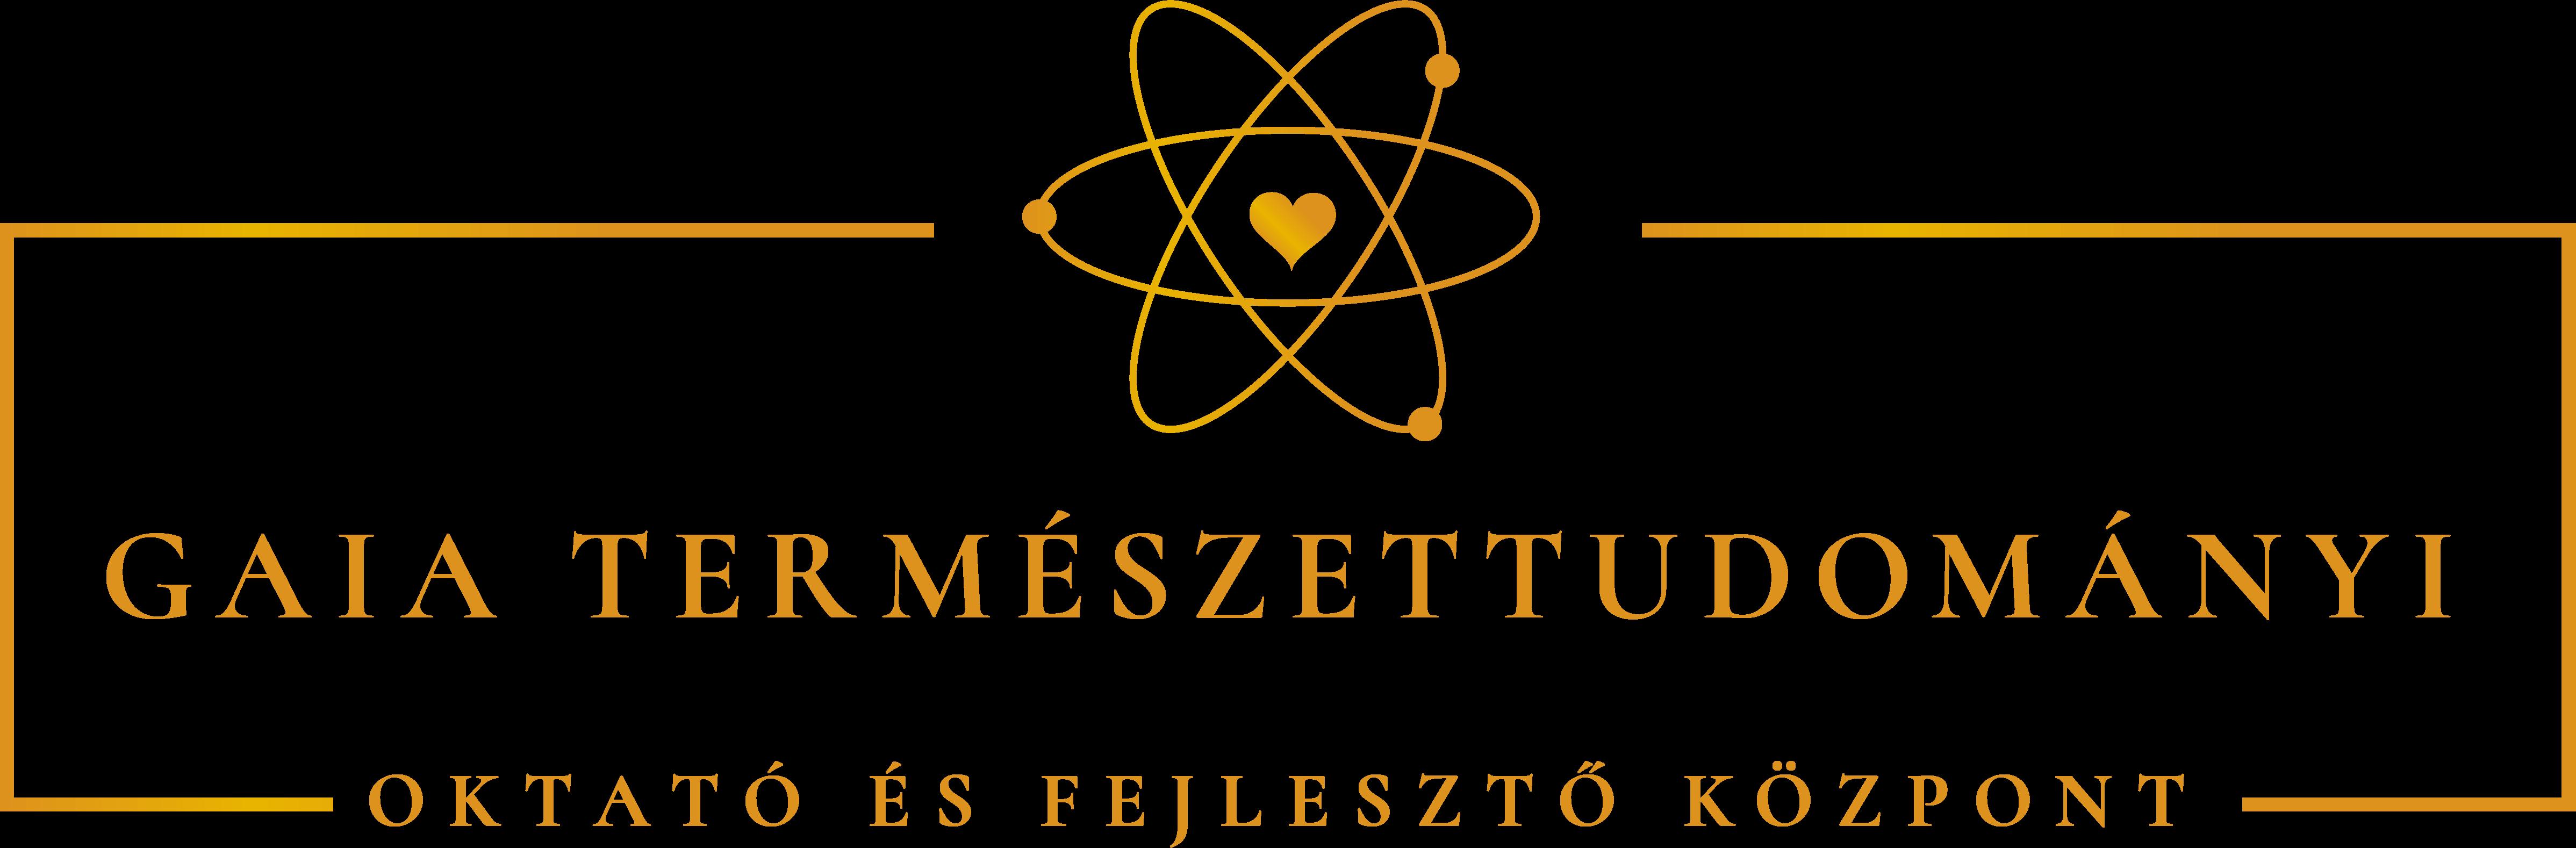 gaia termeszettudomany logo